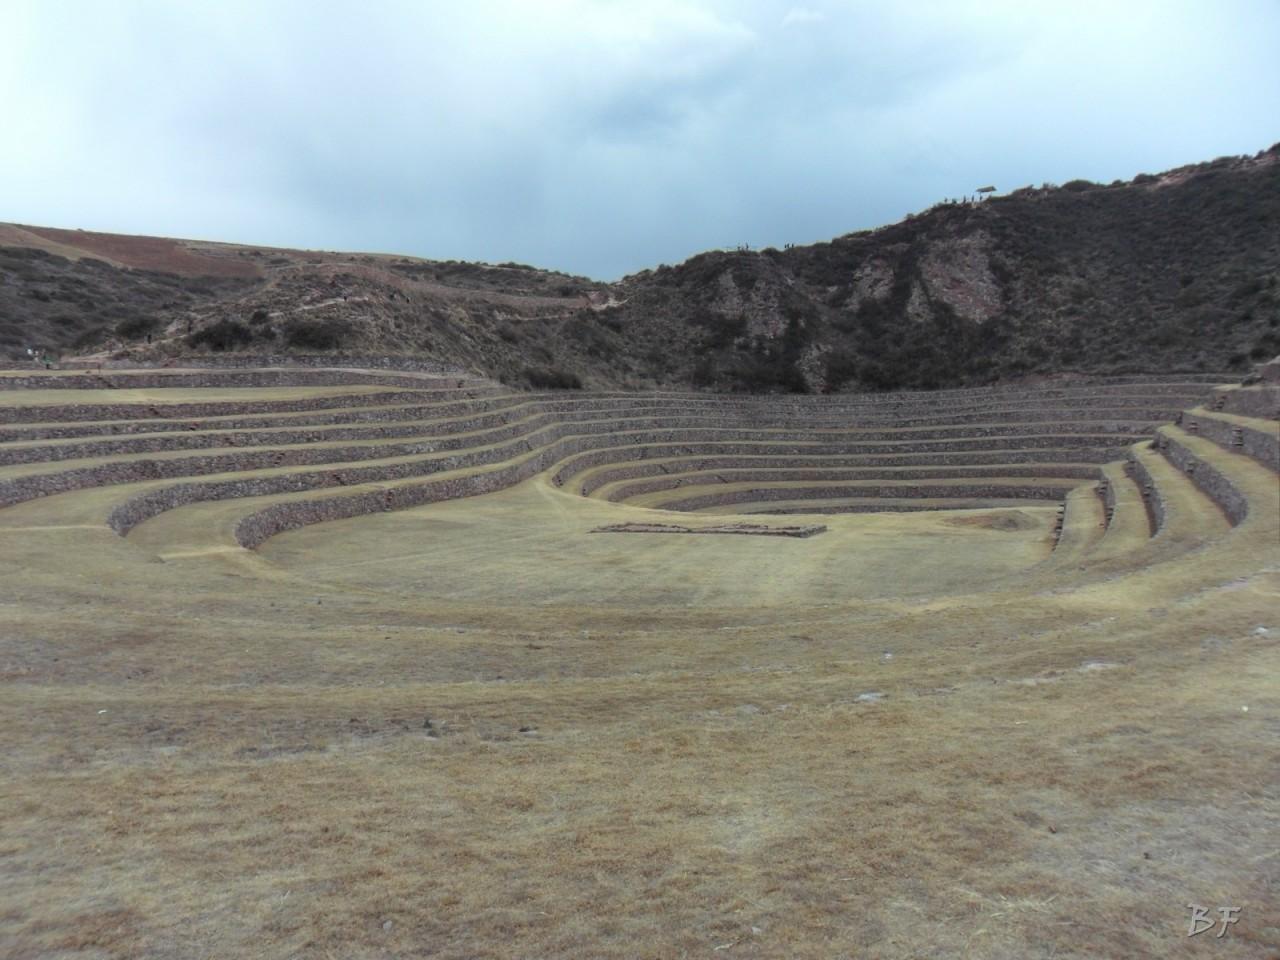 Terrazze-Circolari-Megaliti-Moray-Saline-Maras-Cusco-Perù-4